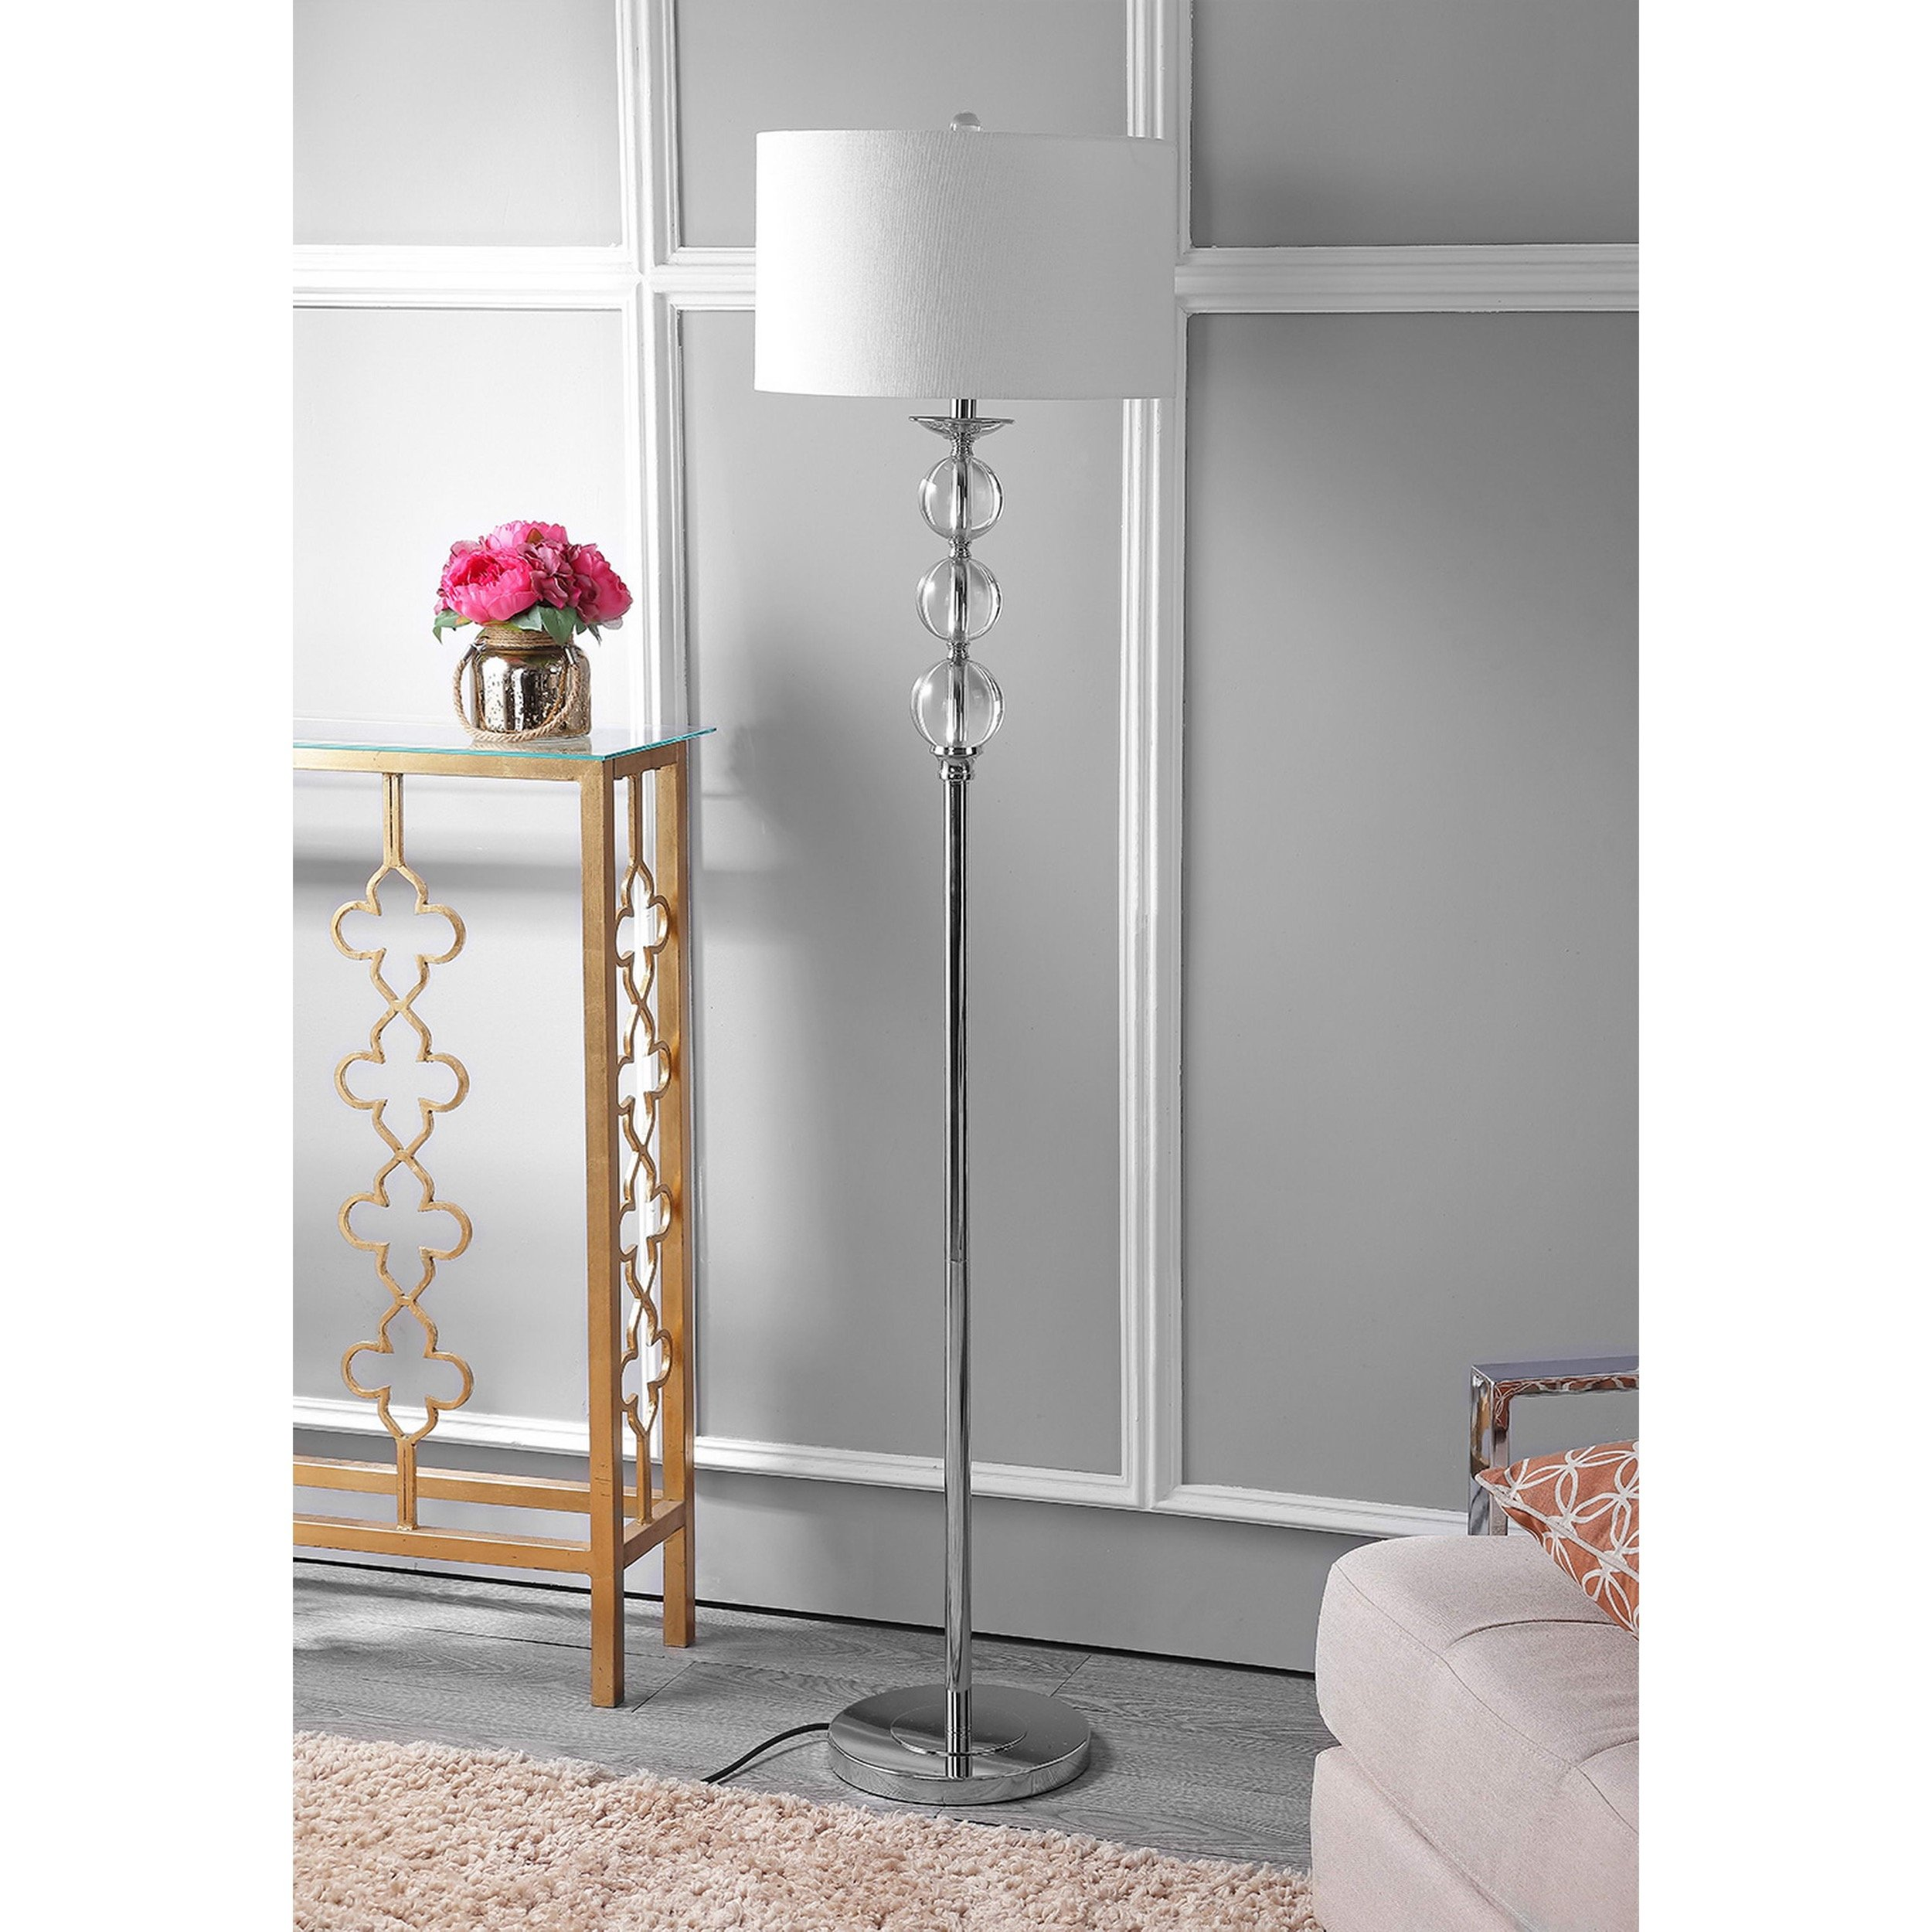 Safavieh Lighting Collection Pippa Glass Globe 62-inch Floor Lamp